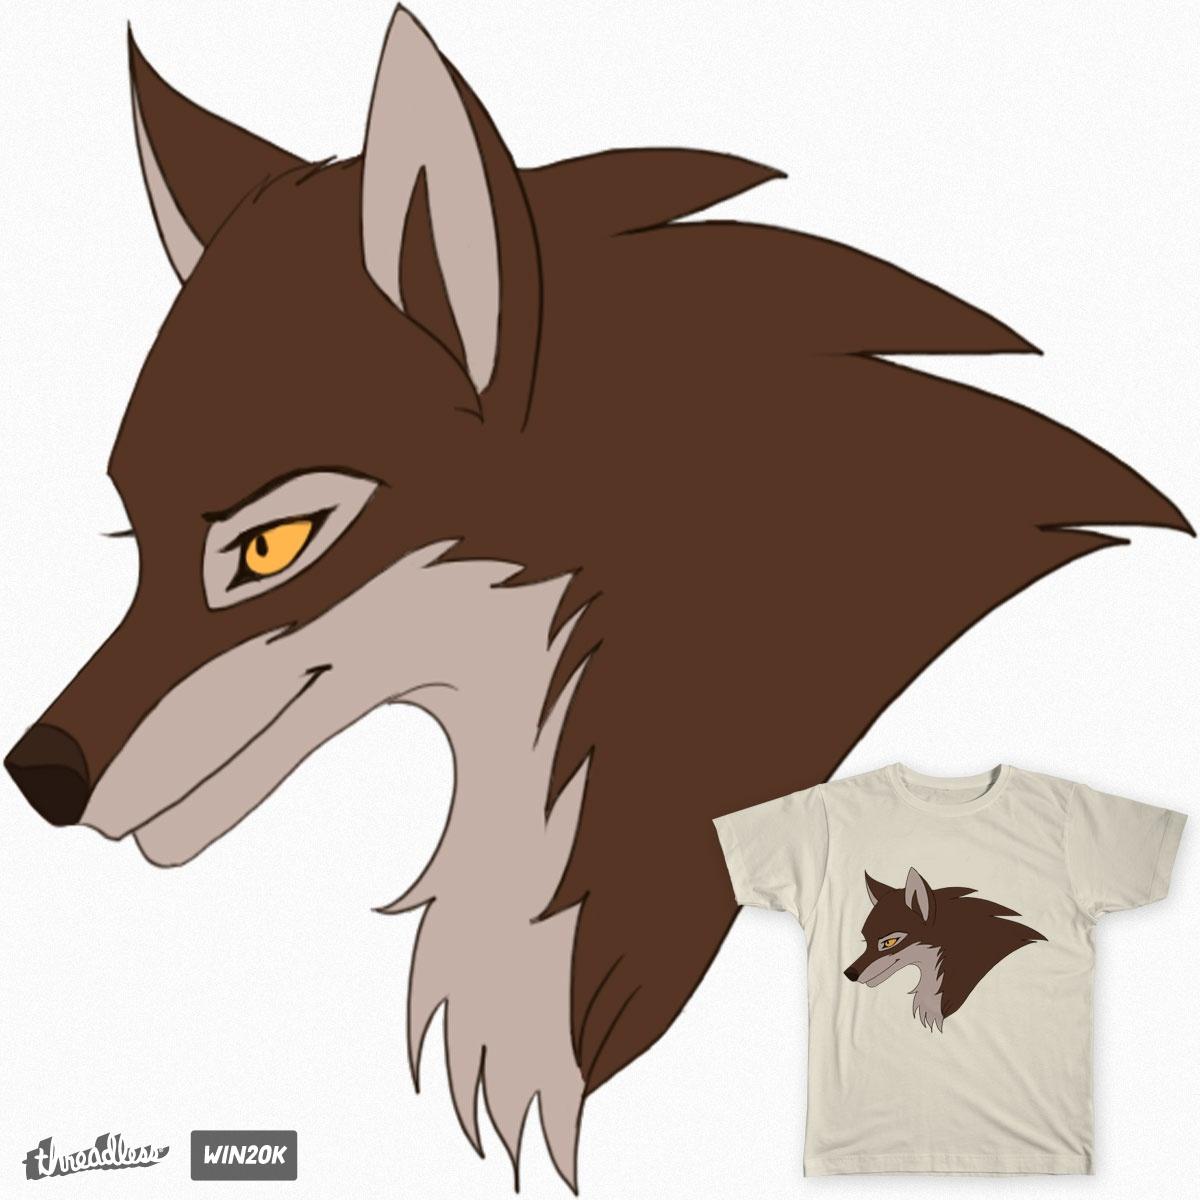 wolf t-shirt by astawolf on Threadless